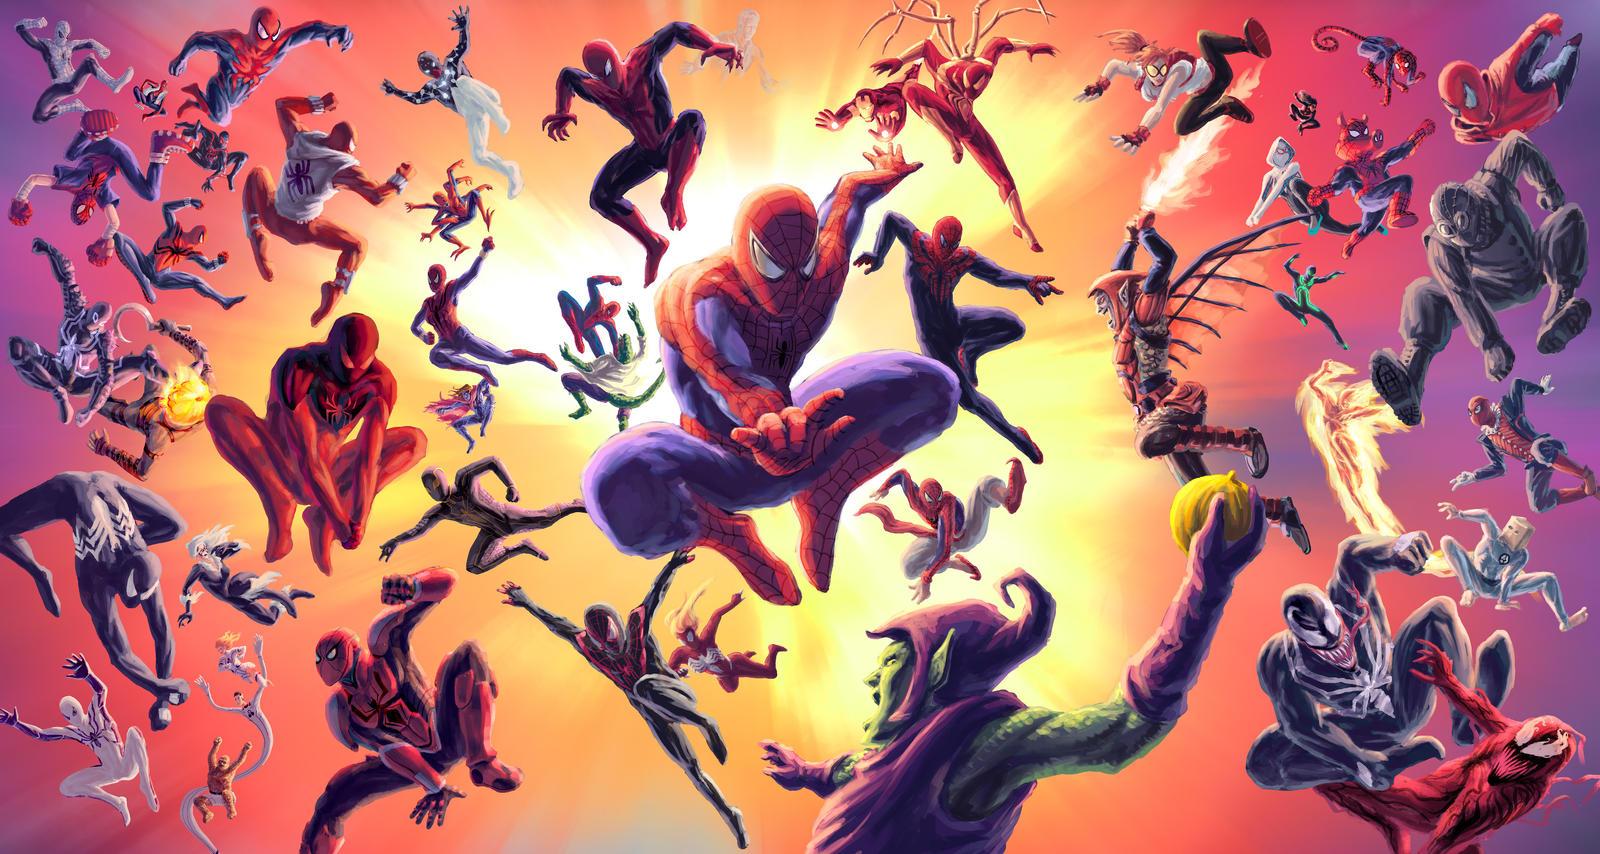 MARVEL COMICS PETER PARKER SPIDER-MAN MARCH '97 #78 VOL. 1 NO. 78 COLD BLOODED